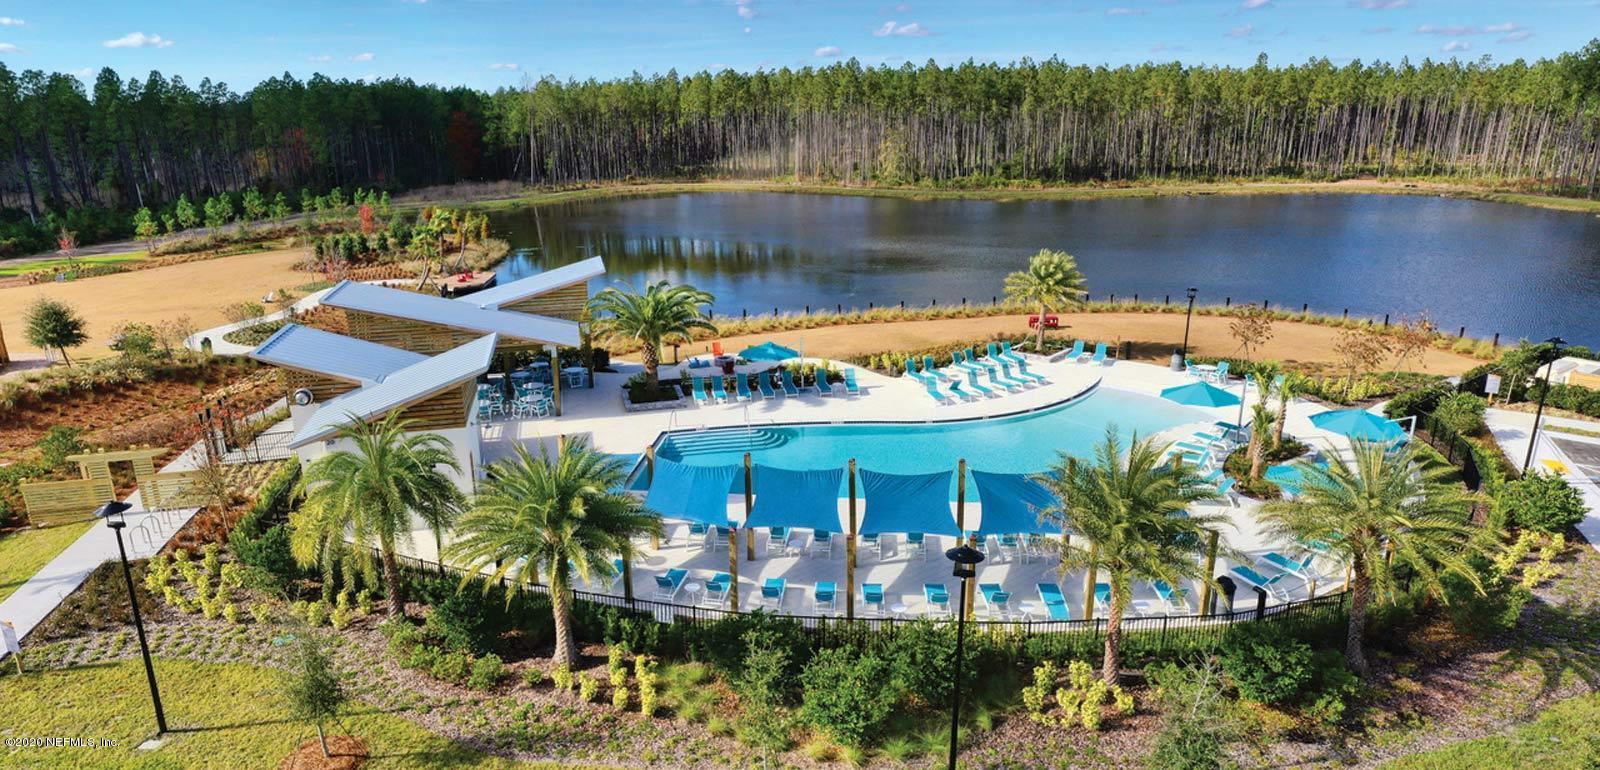 481 FIREBRUSH, YULEE, FLORIDA 32097, 3 Bedrooms Bedrooms, ,2 BathroomsBathrooms,Residential,For sale,FIREBRUSH,1083044